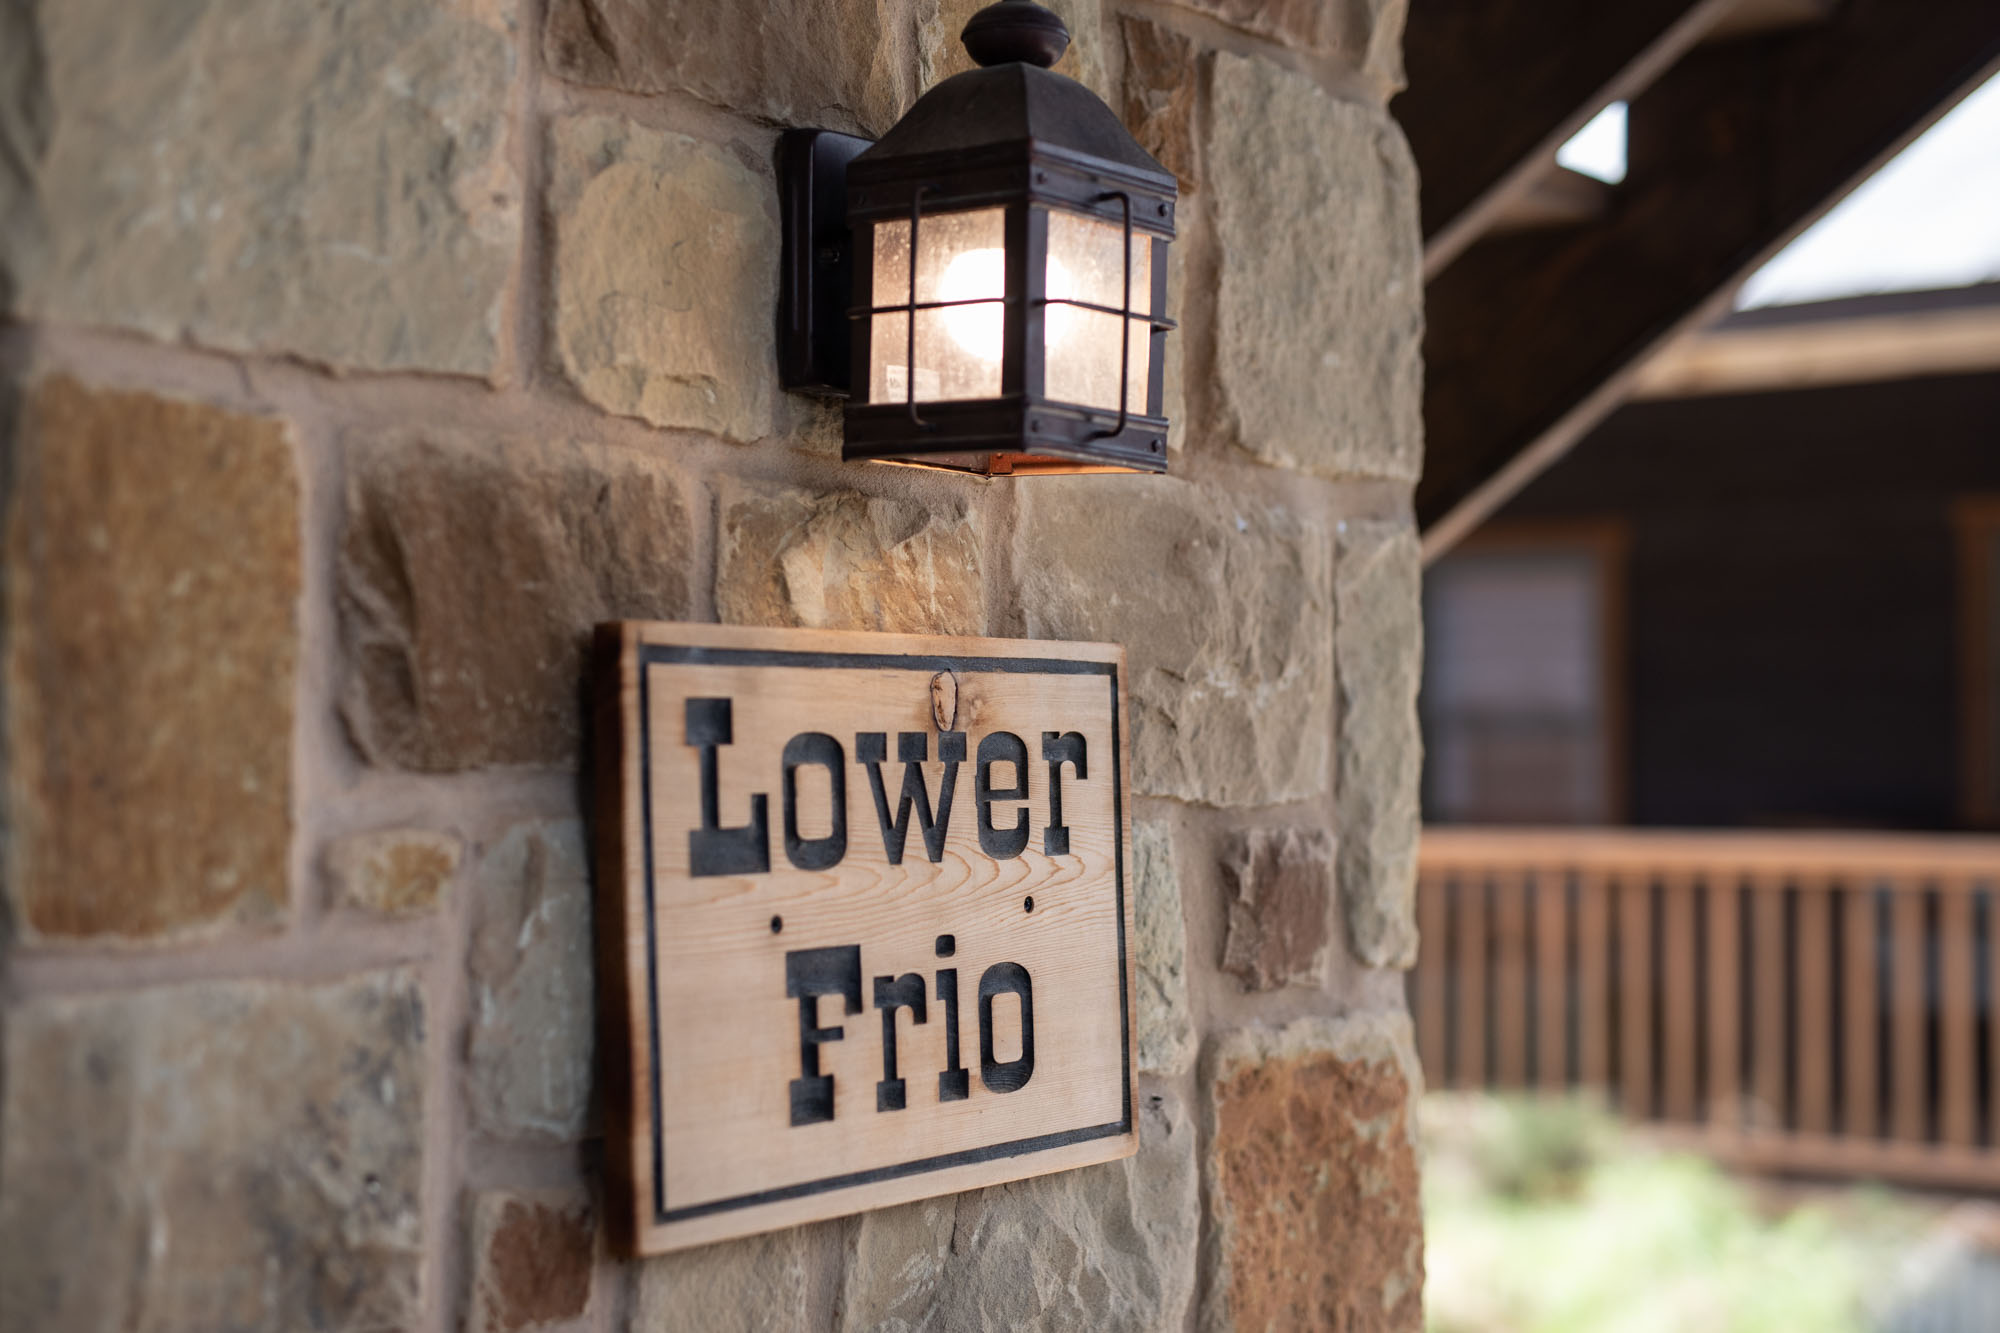 Lower-Frio-9